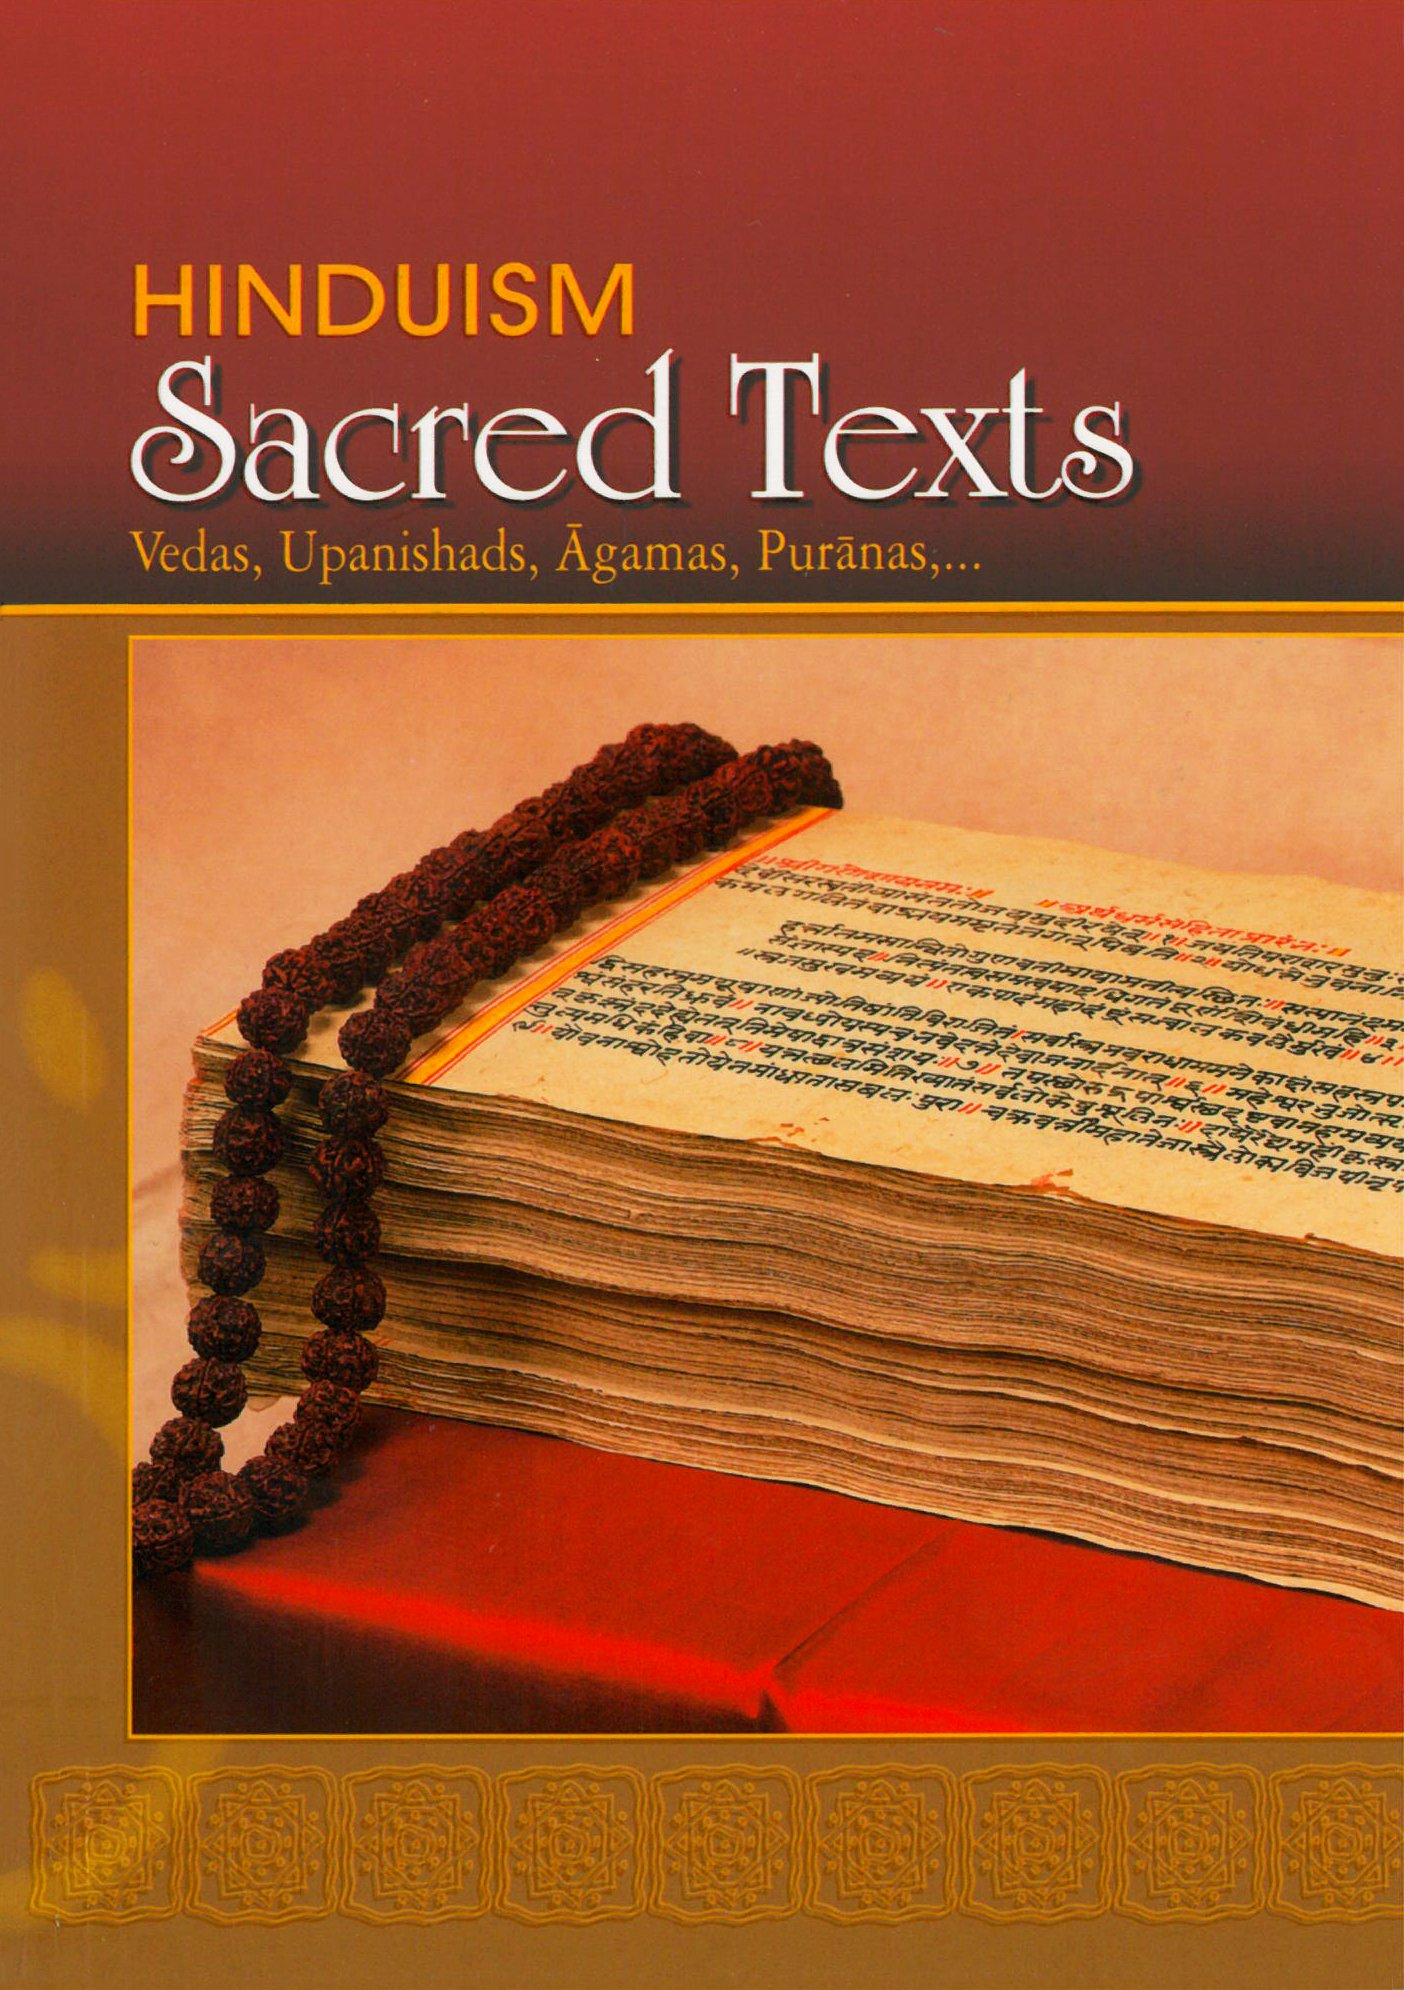 Amazon.in: Buy Hinduism: Sacred Texts - Vedas, Upanishads, Agamas ...